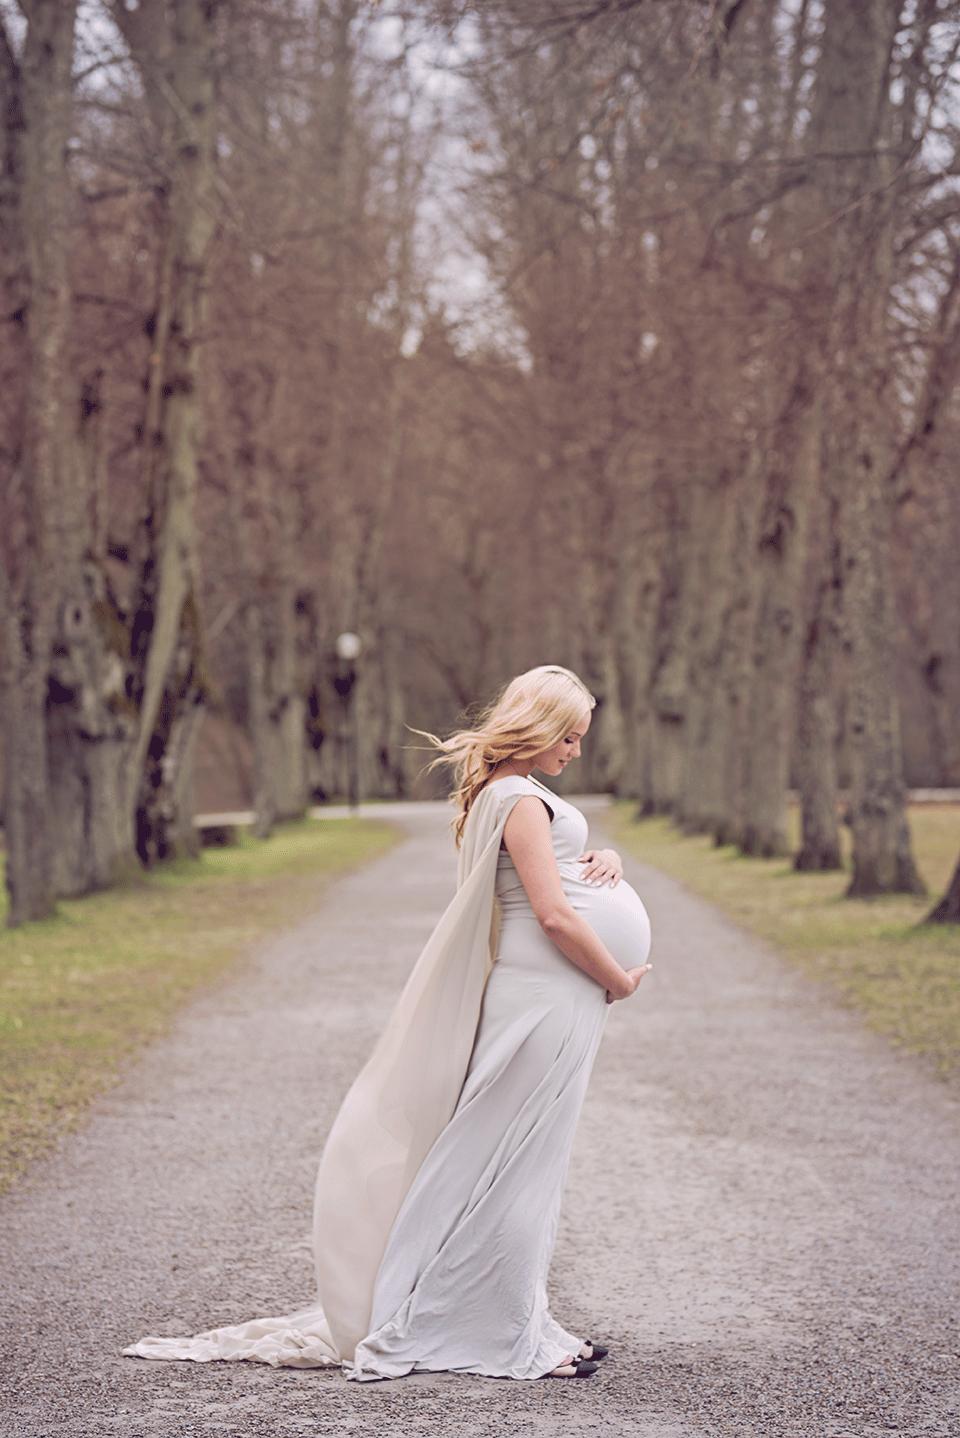 Fotograf-Emma-Schödin_Ellinor-Eriksson_001.png